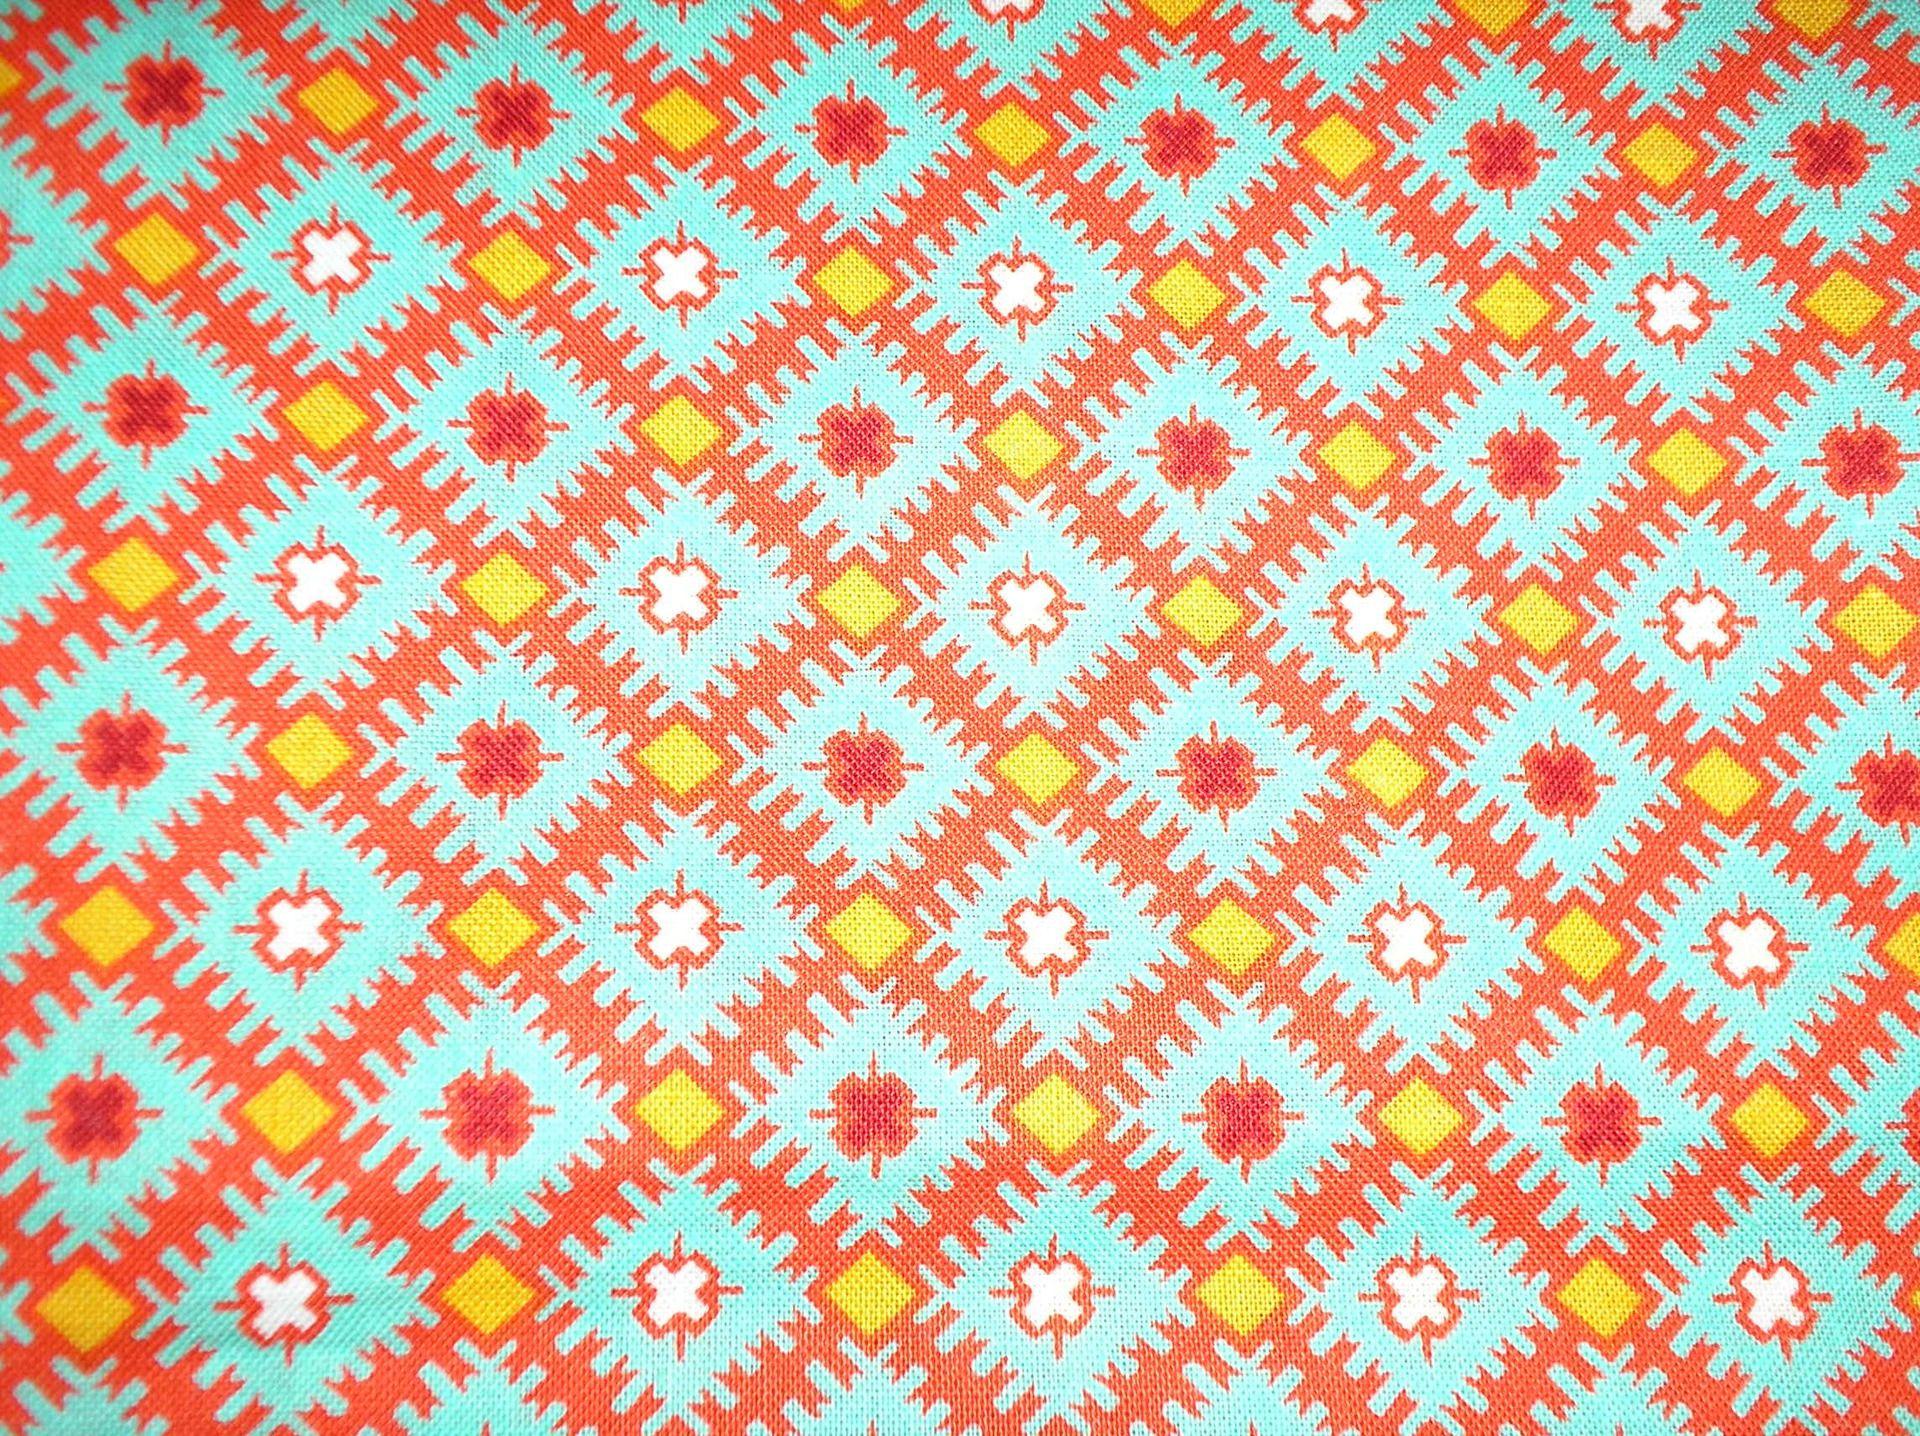 tissus fleurs kitch et r tro indien n 1 tissus pour patchwork par mafalda7408 tissus et. Black Bedroom Furniture Sets. Home Design Ideas